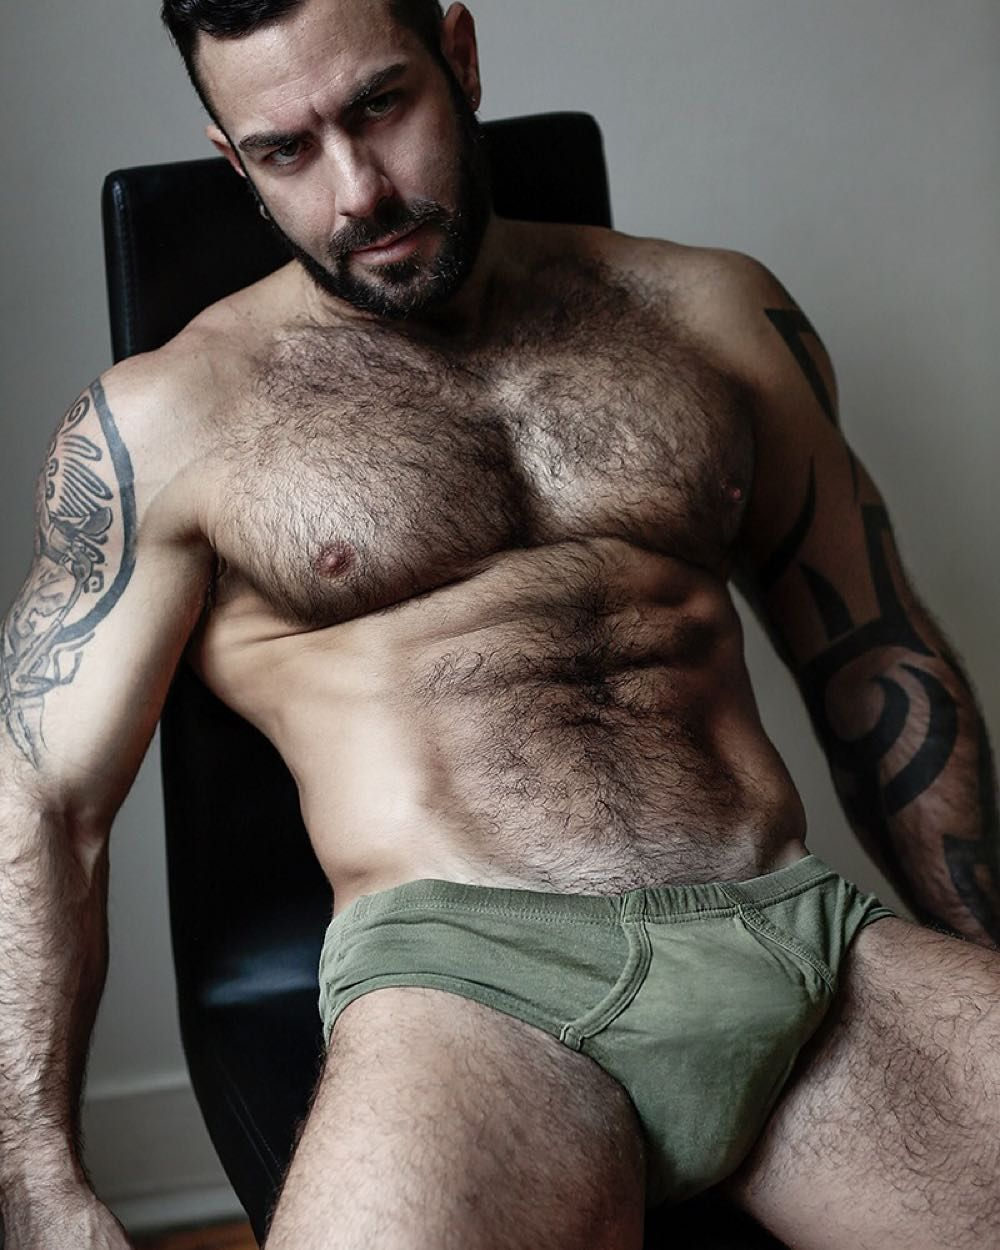 Sam truitt gay porn hairy balls sexy straight